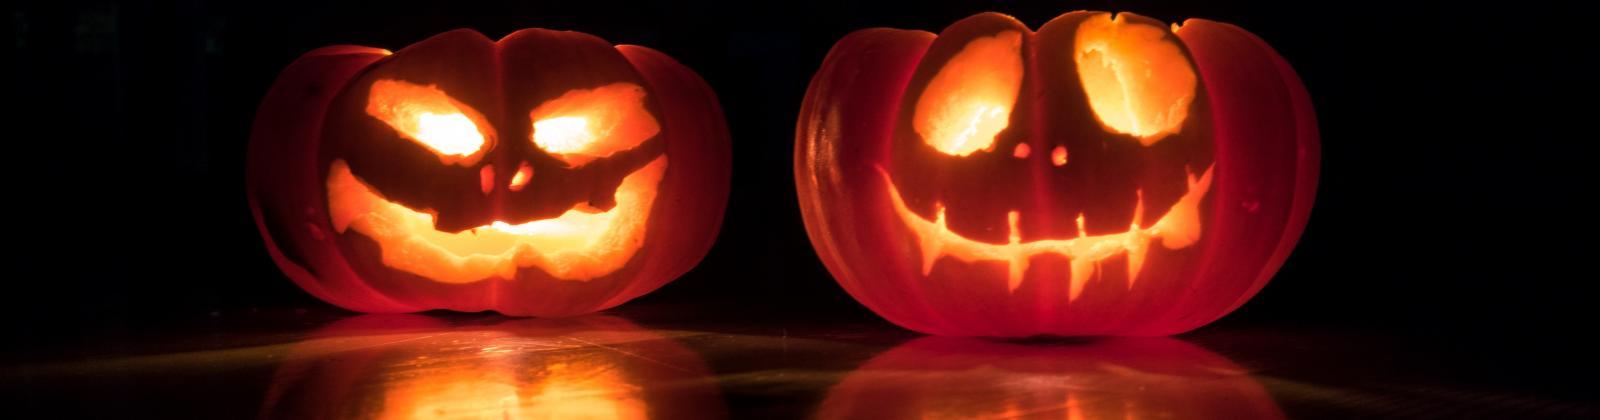 Two jack-o-lanterns in a dark room